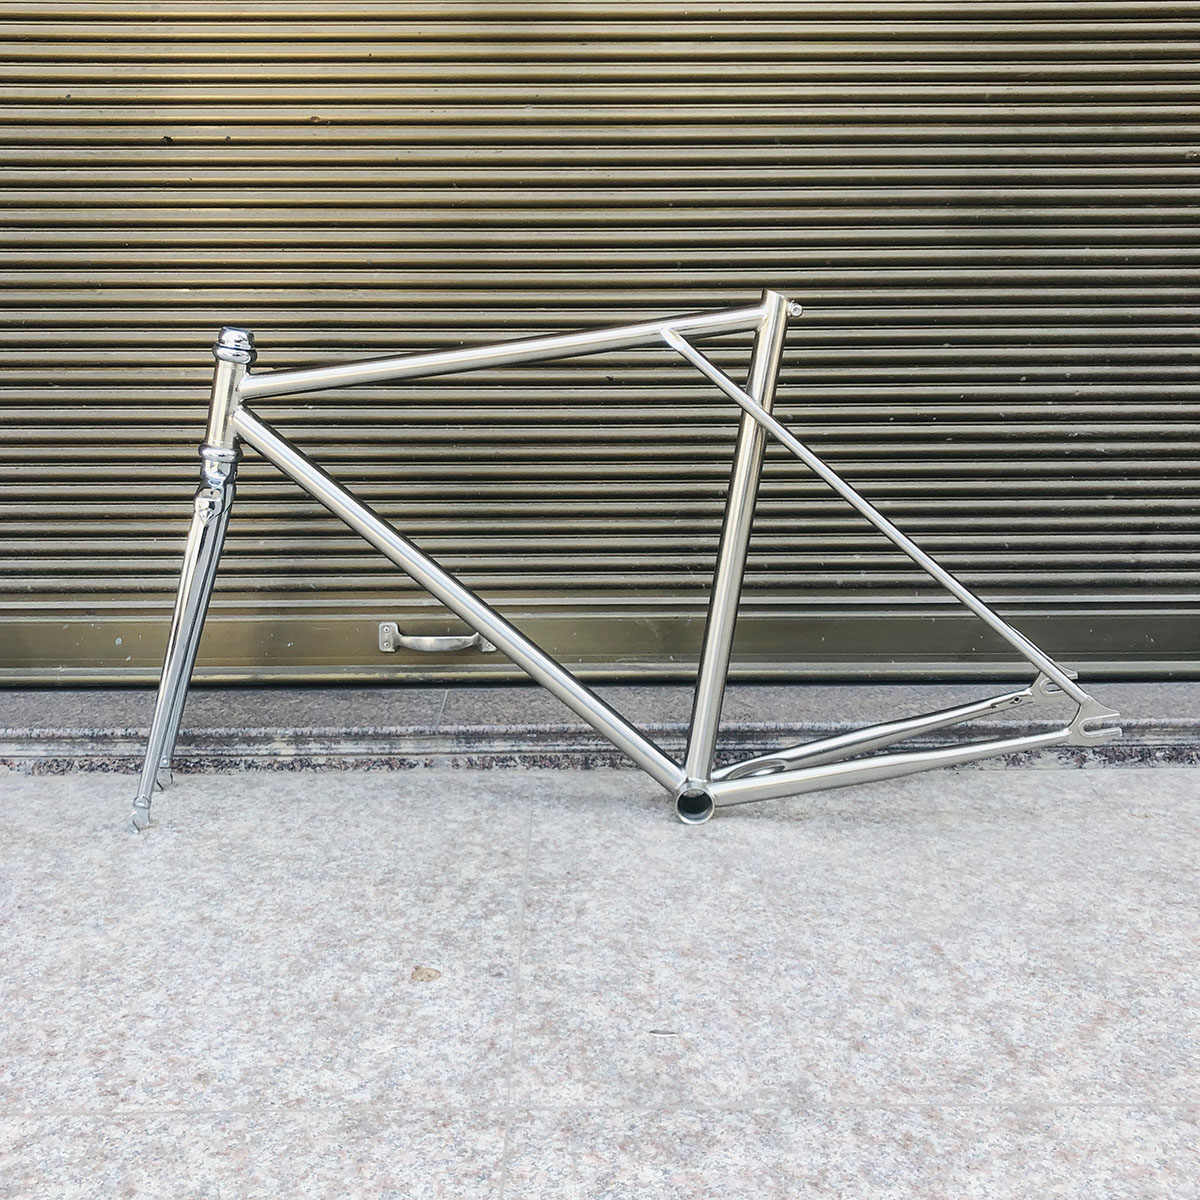 Geborsteld Zilver Vintager Fixie Bike Frame 700 C Frame 53 Cm 4130 Chroom-molybdeen Staal Road Fiets Frame Promotie